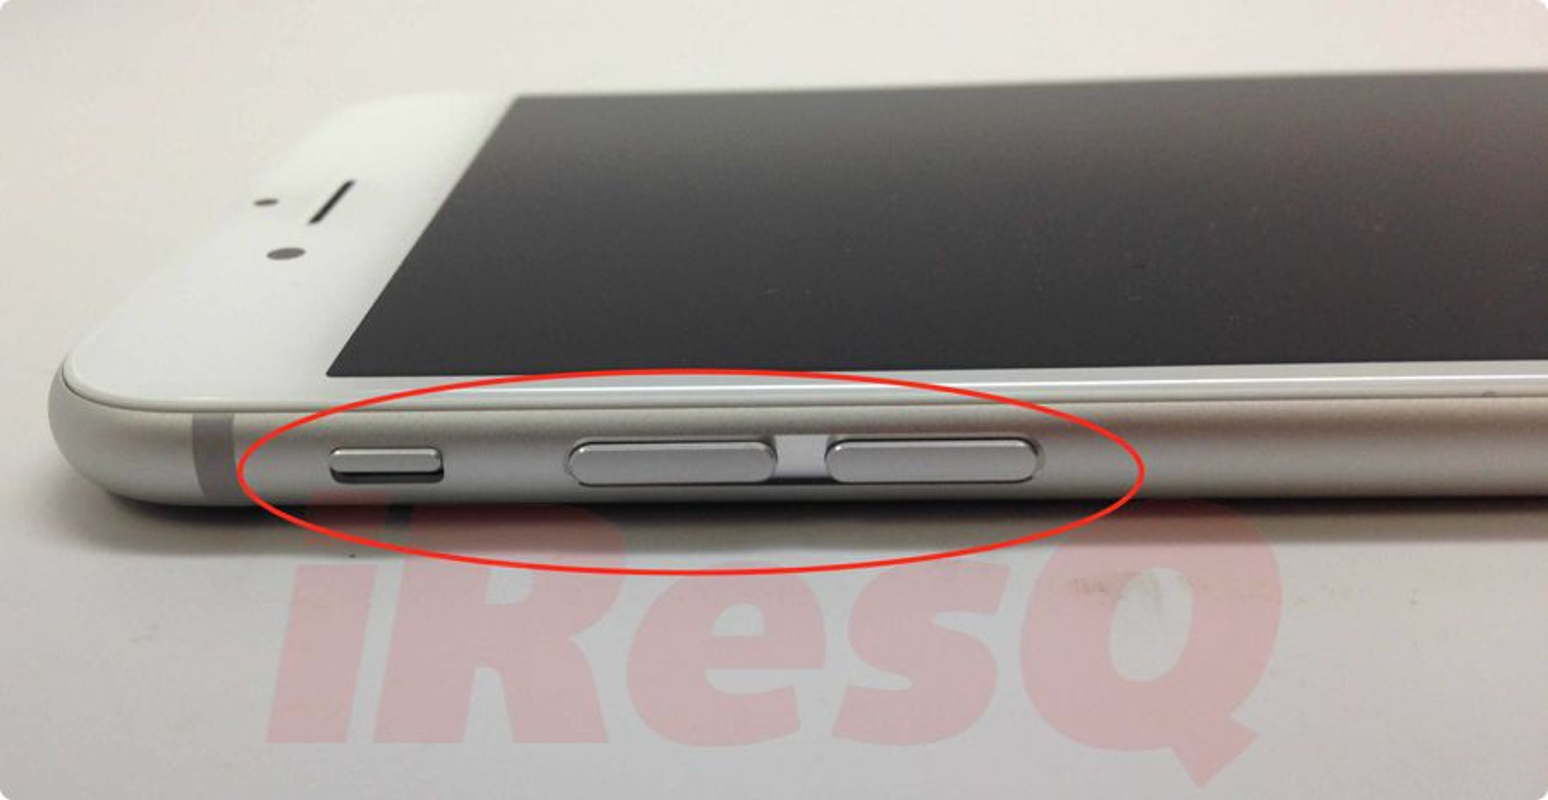 Kinh nghiem mua iPhone cu gia re, chat luong-Hinh-9